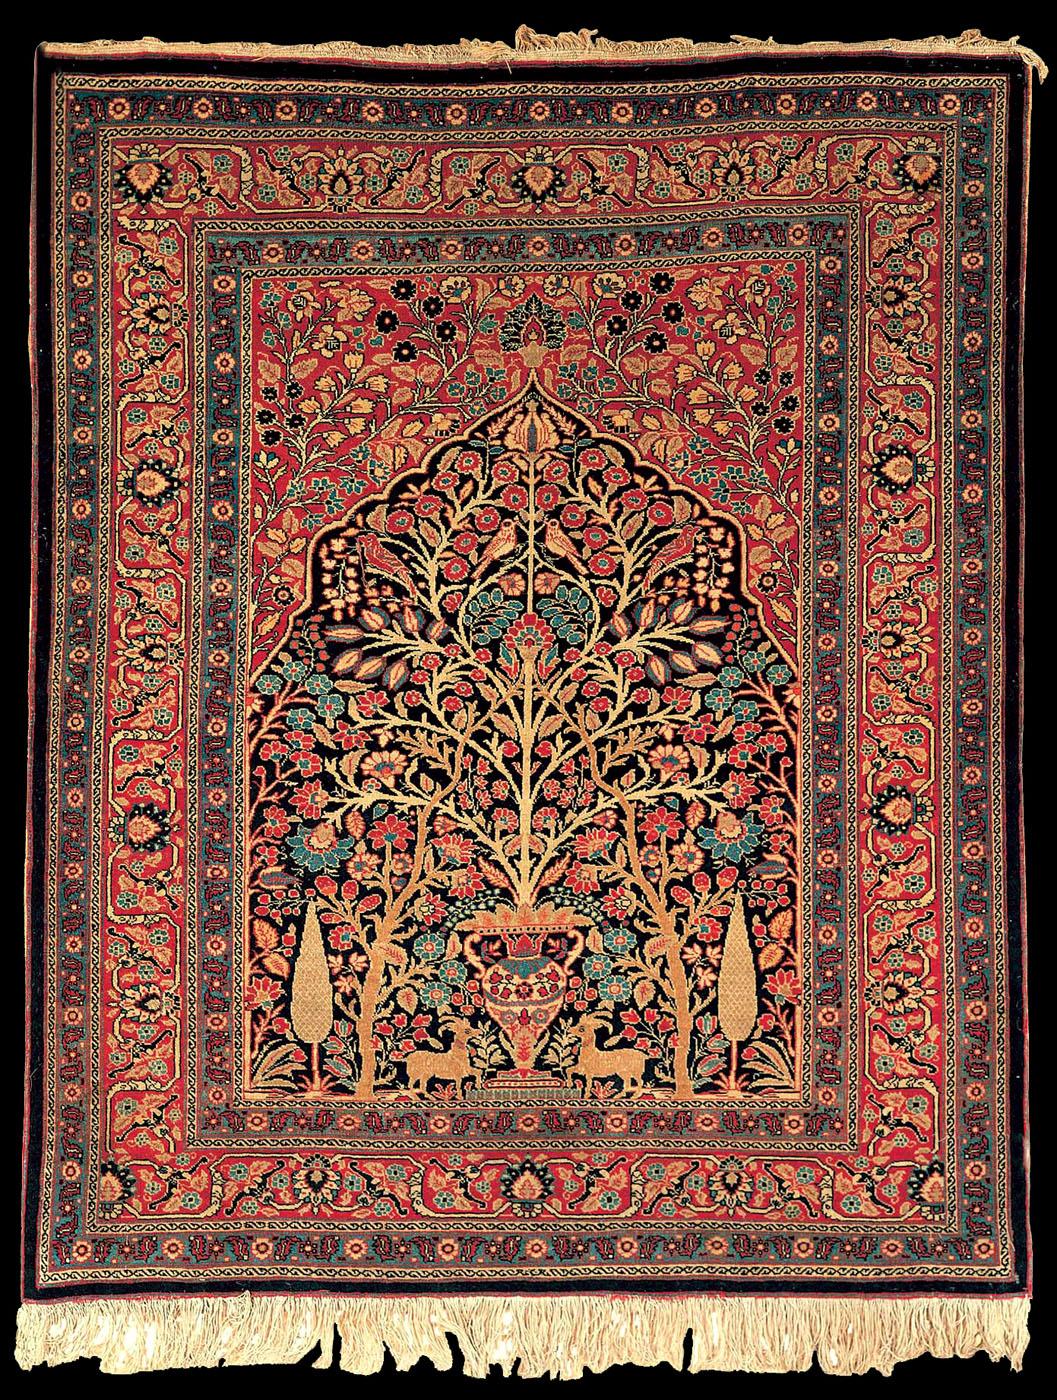 tabriz and carpet Lot: tabriz 'amirkhiz' carpet (signed),, lot number: 7134, starting bid: €100, auctioneer: henry's auktionshaus ag, auction: rugs.